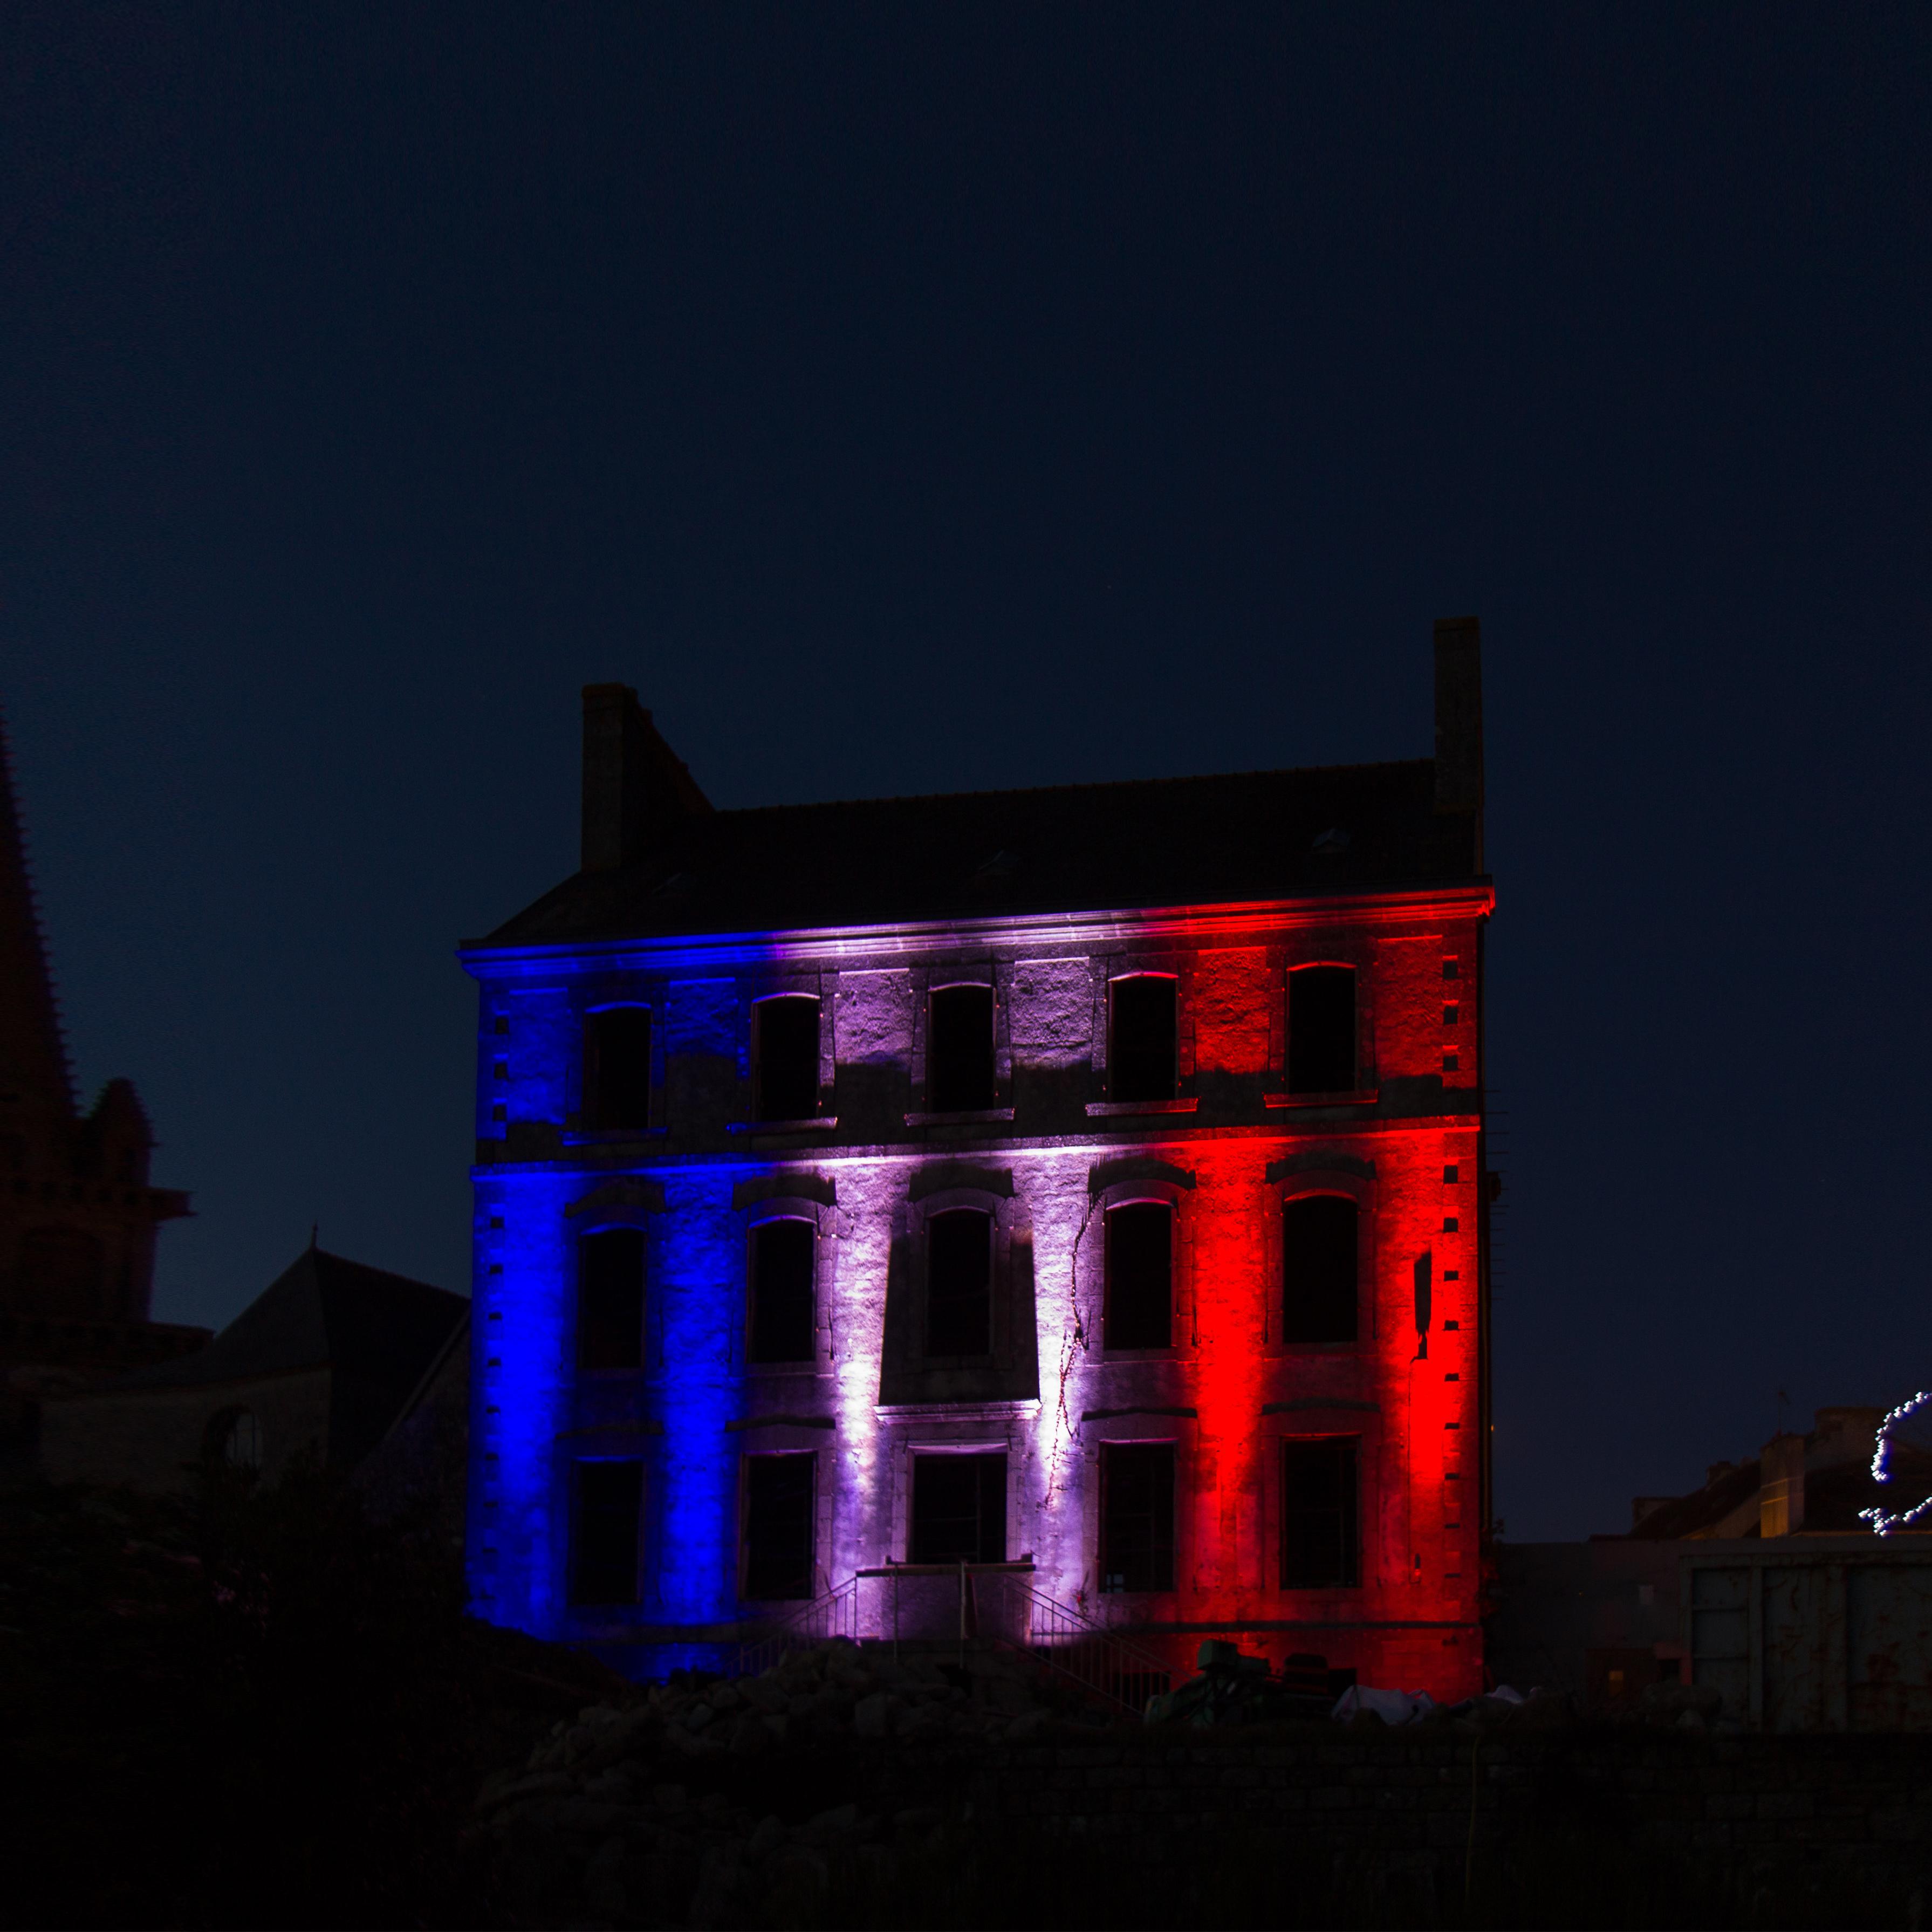 Tarifs Municipaux - Mairie d'Elliant